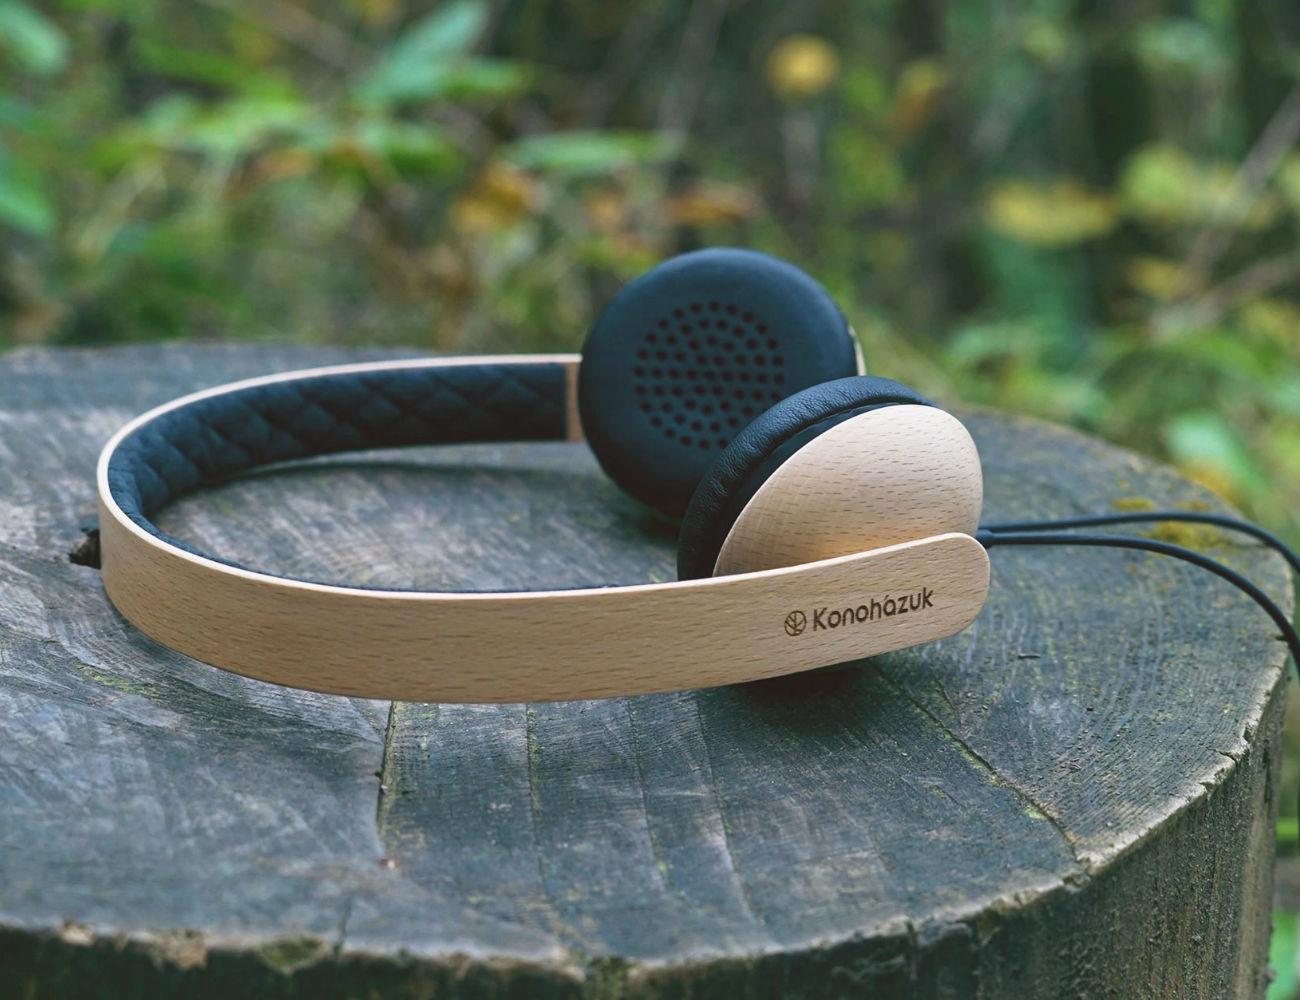 Konohazuk H3 Headphones